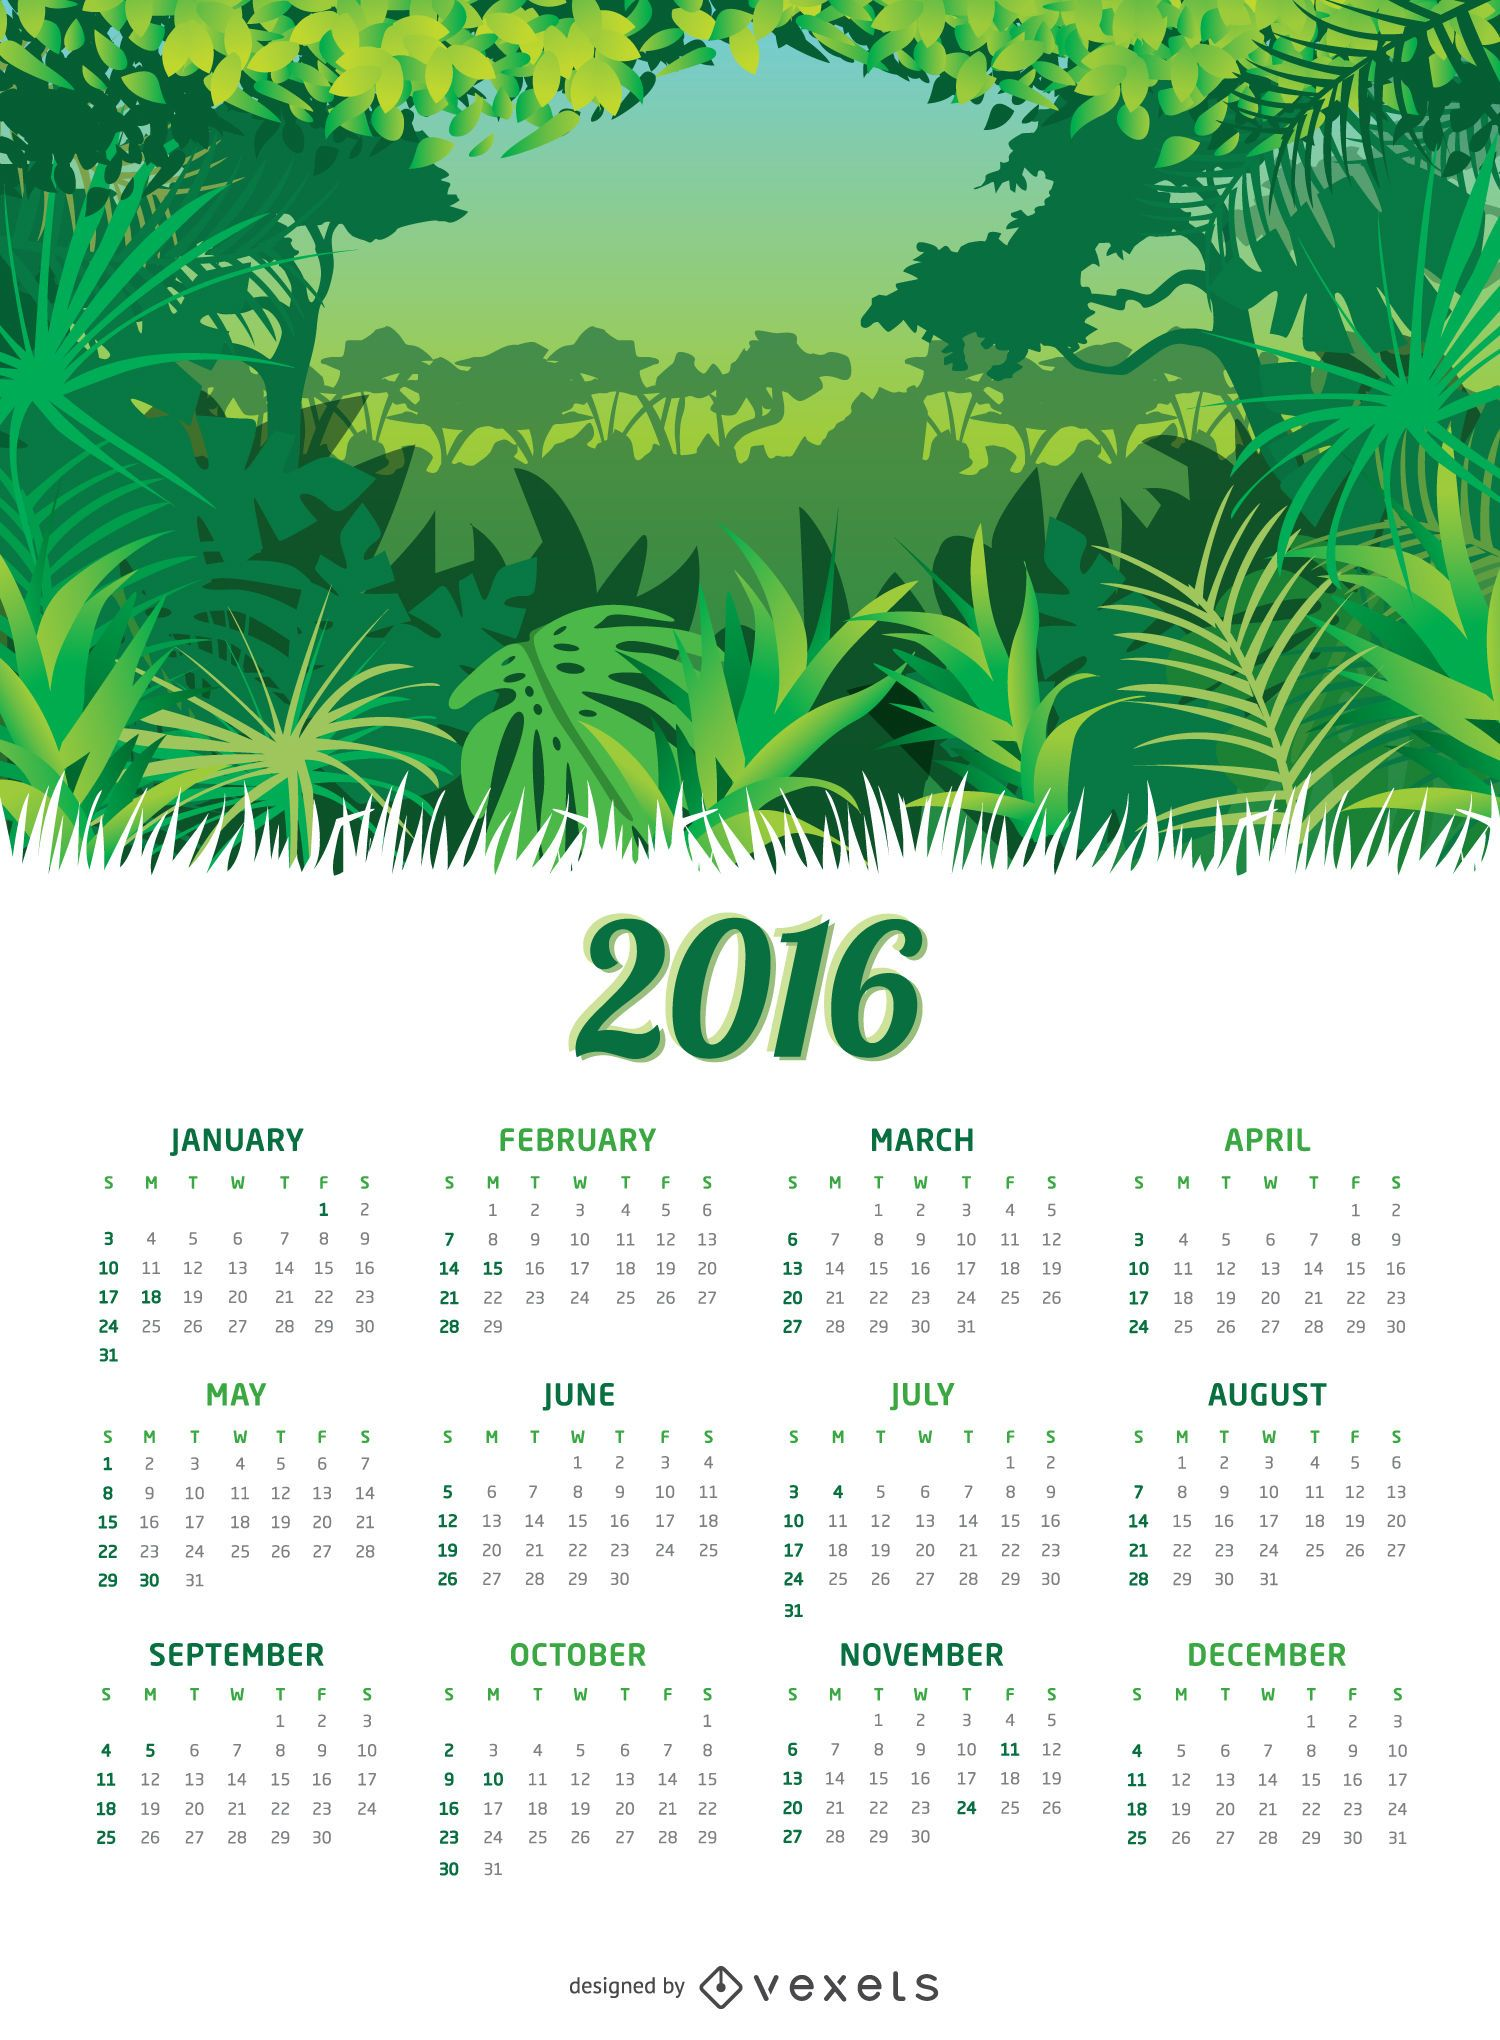 Calendario Jungle 2016